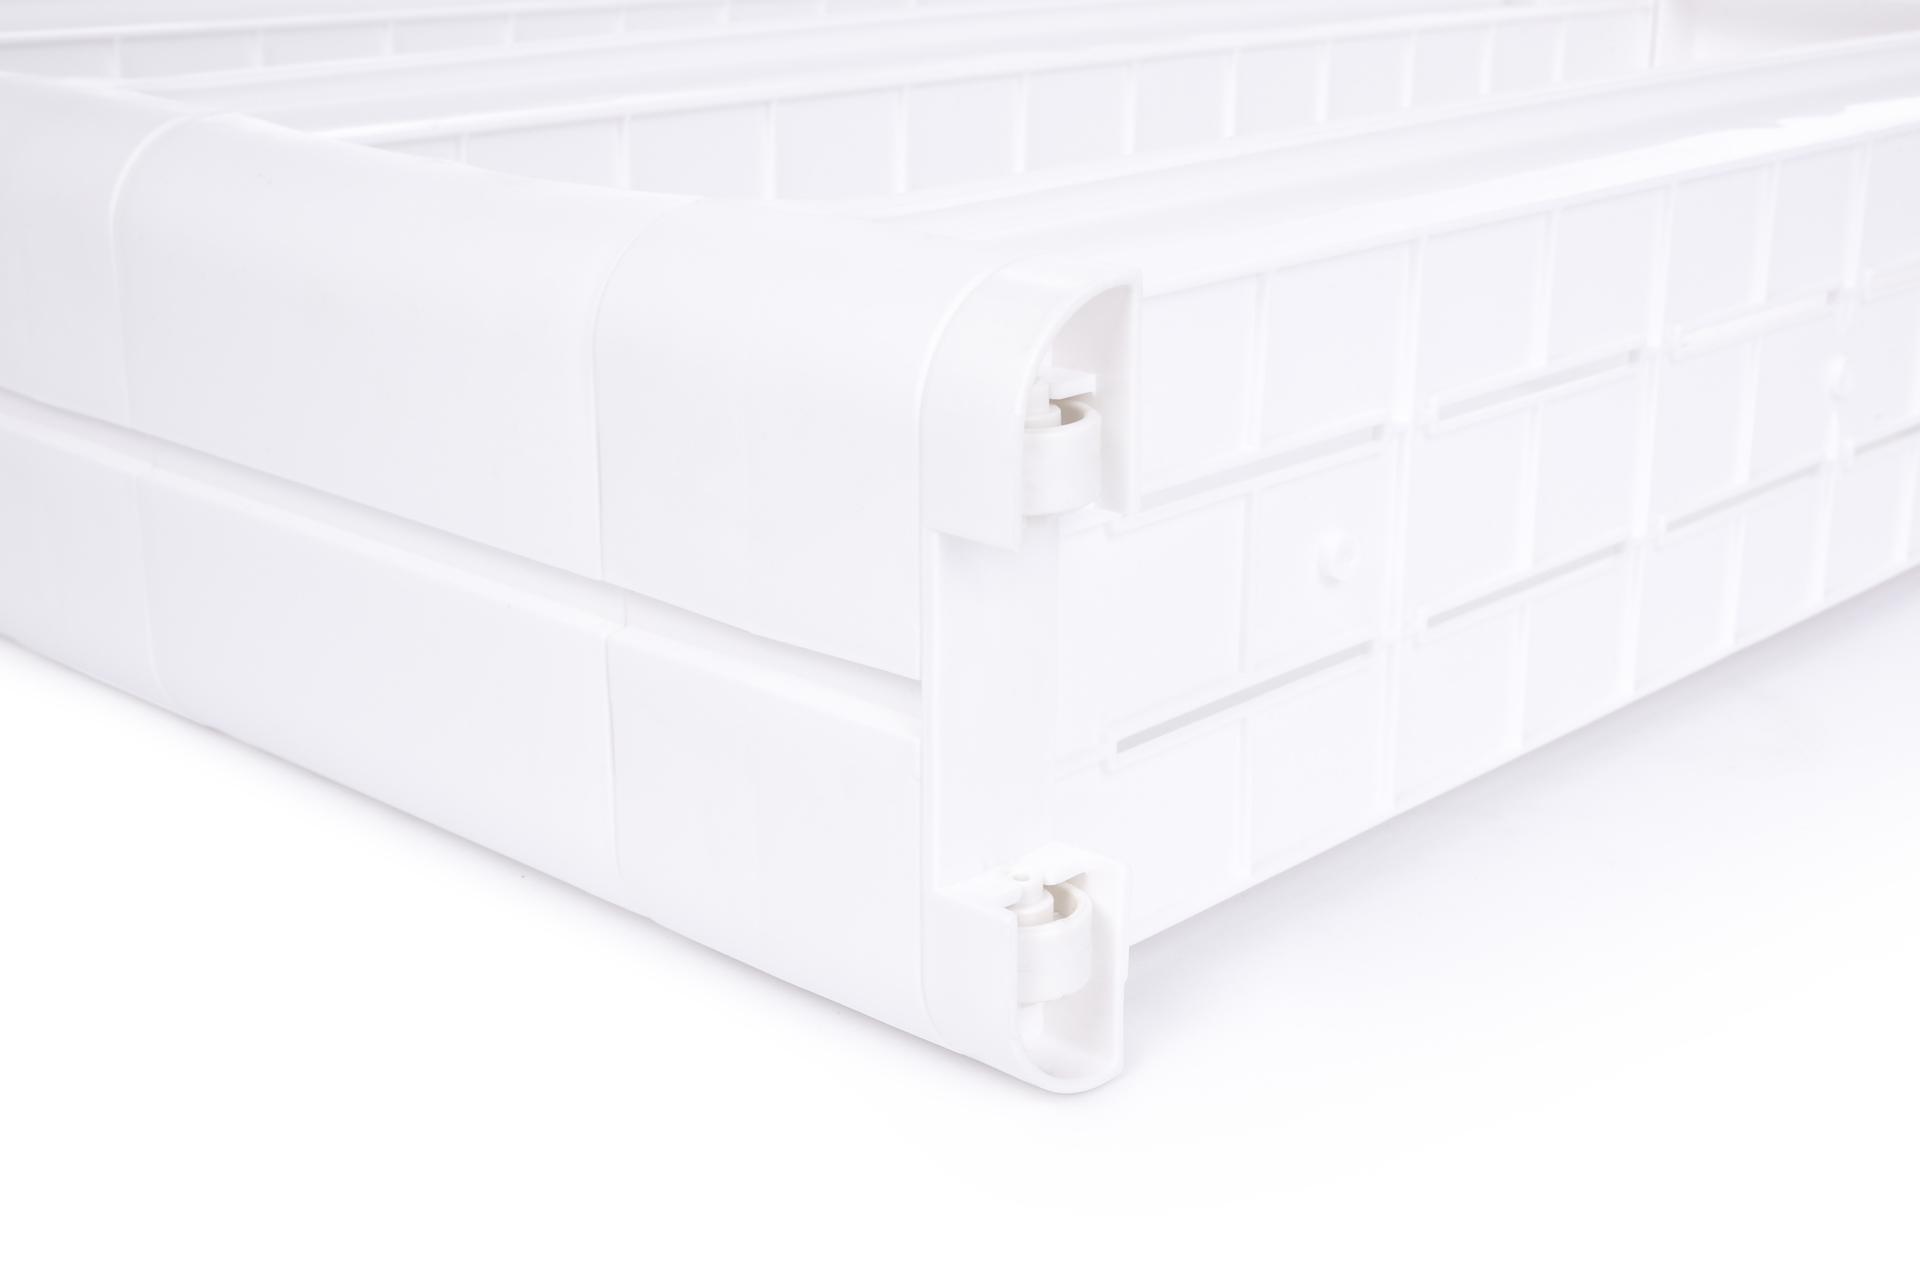 Pojízdný regál SLIM WHITE 11,5 cm do úzkých prostor, 3 patrový